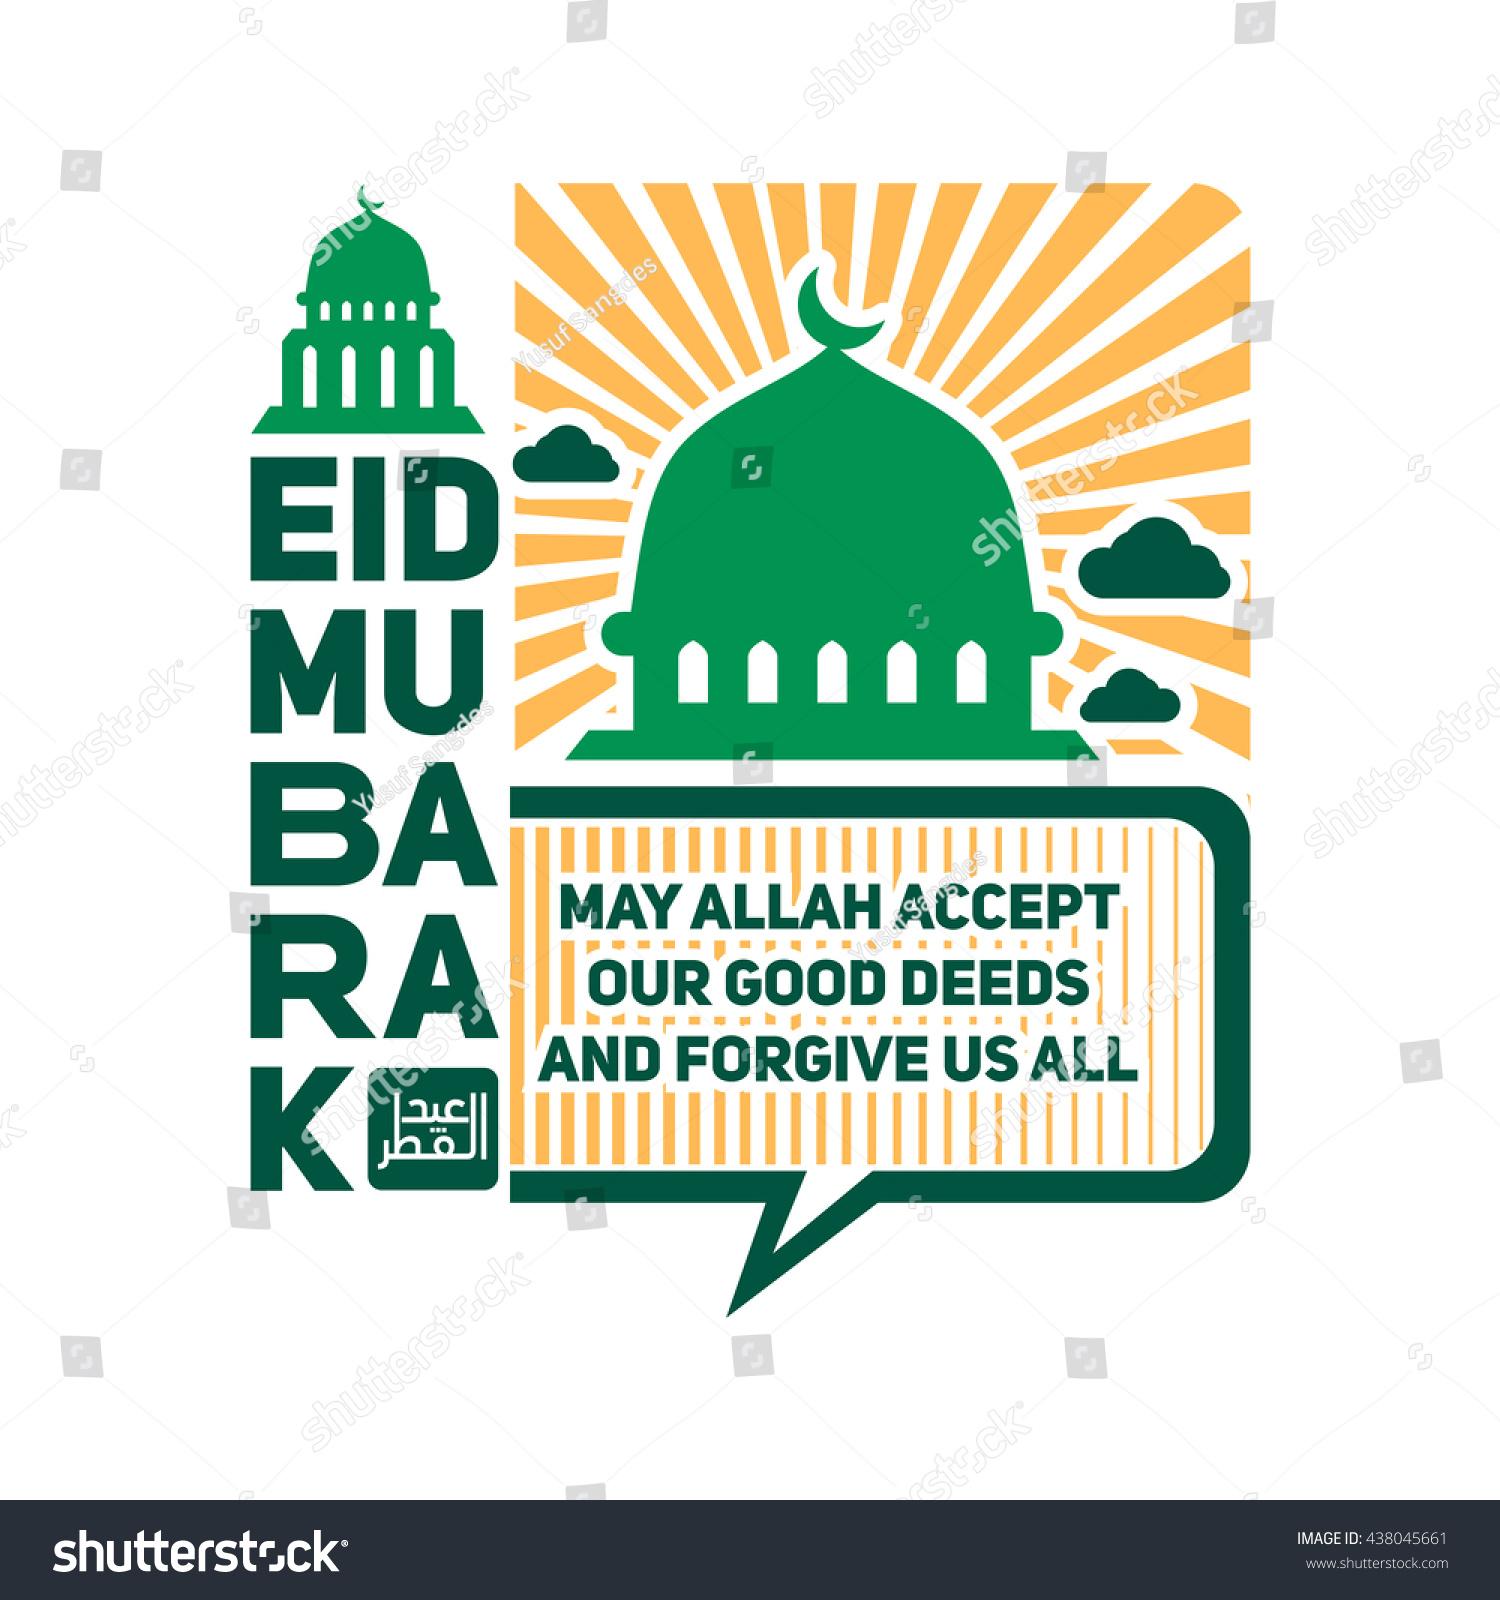 Eid Mubarak Design Islamic Quotes Vector Stock Vector Royalty Free